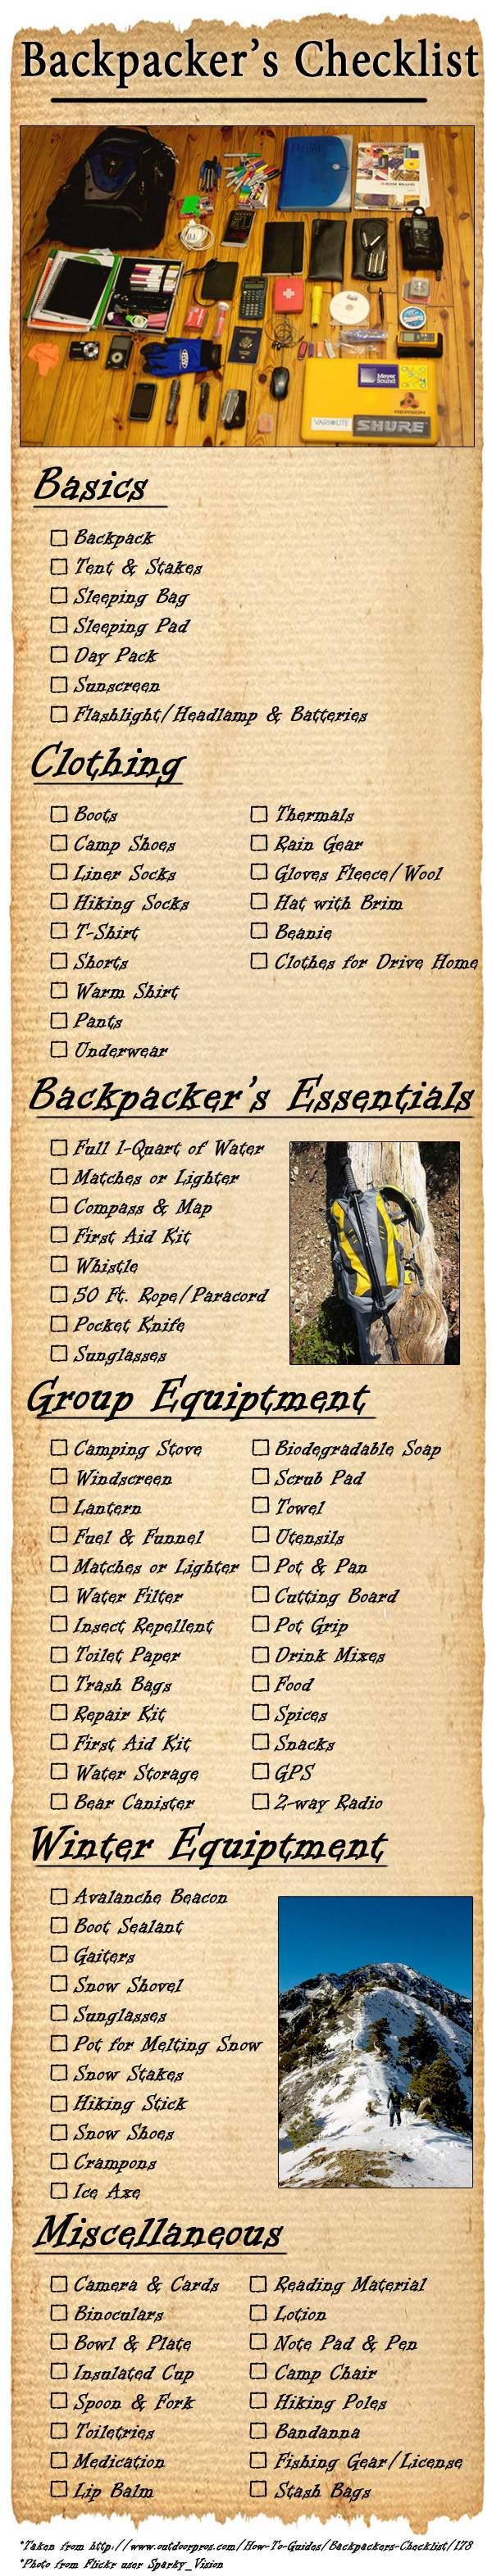 backpackerschecklist_pinay_traveller